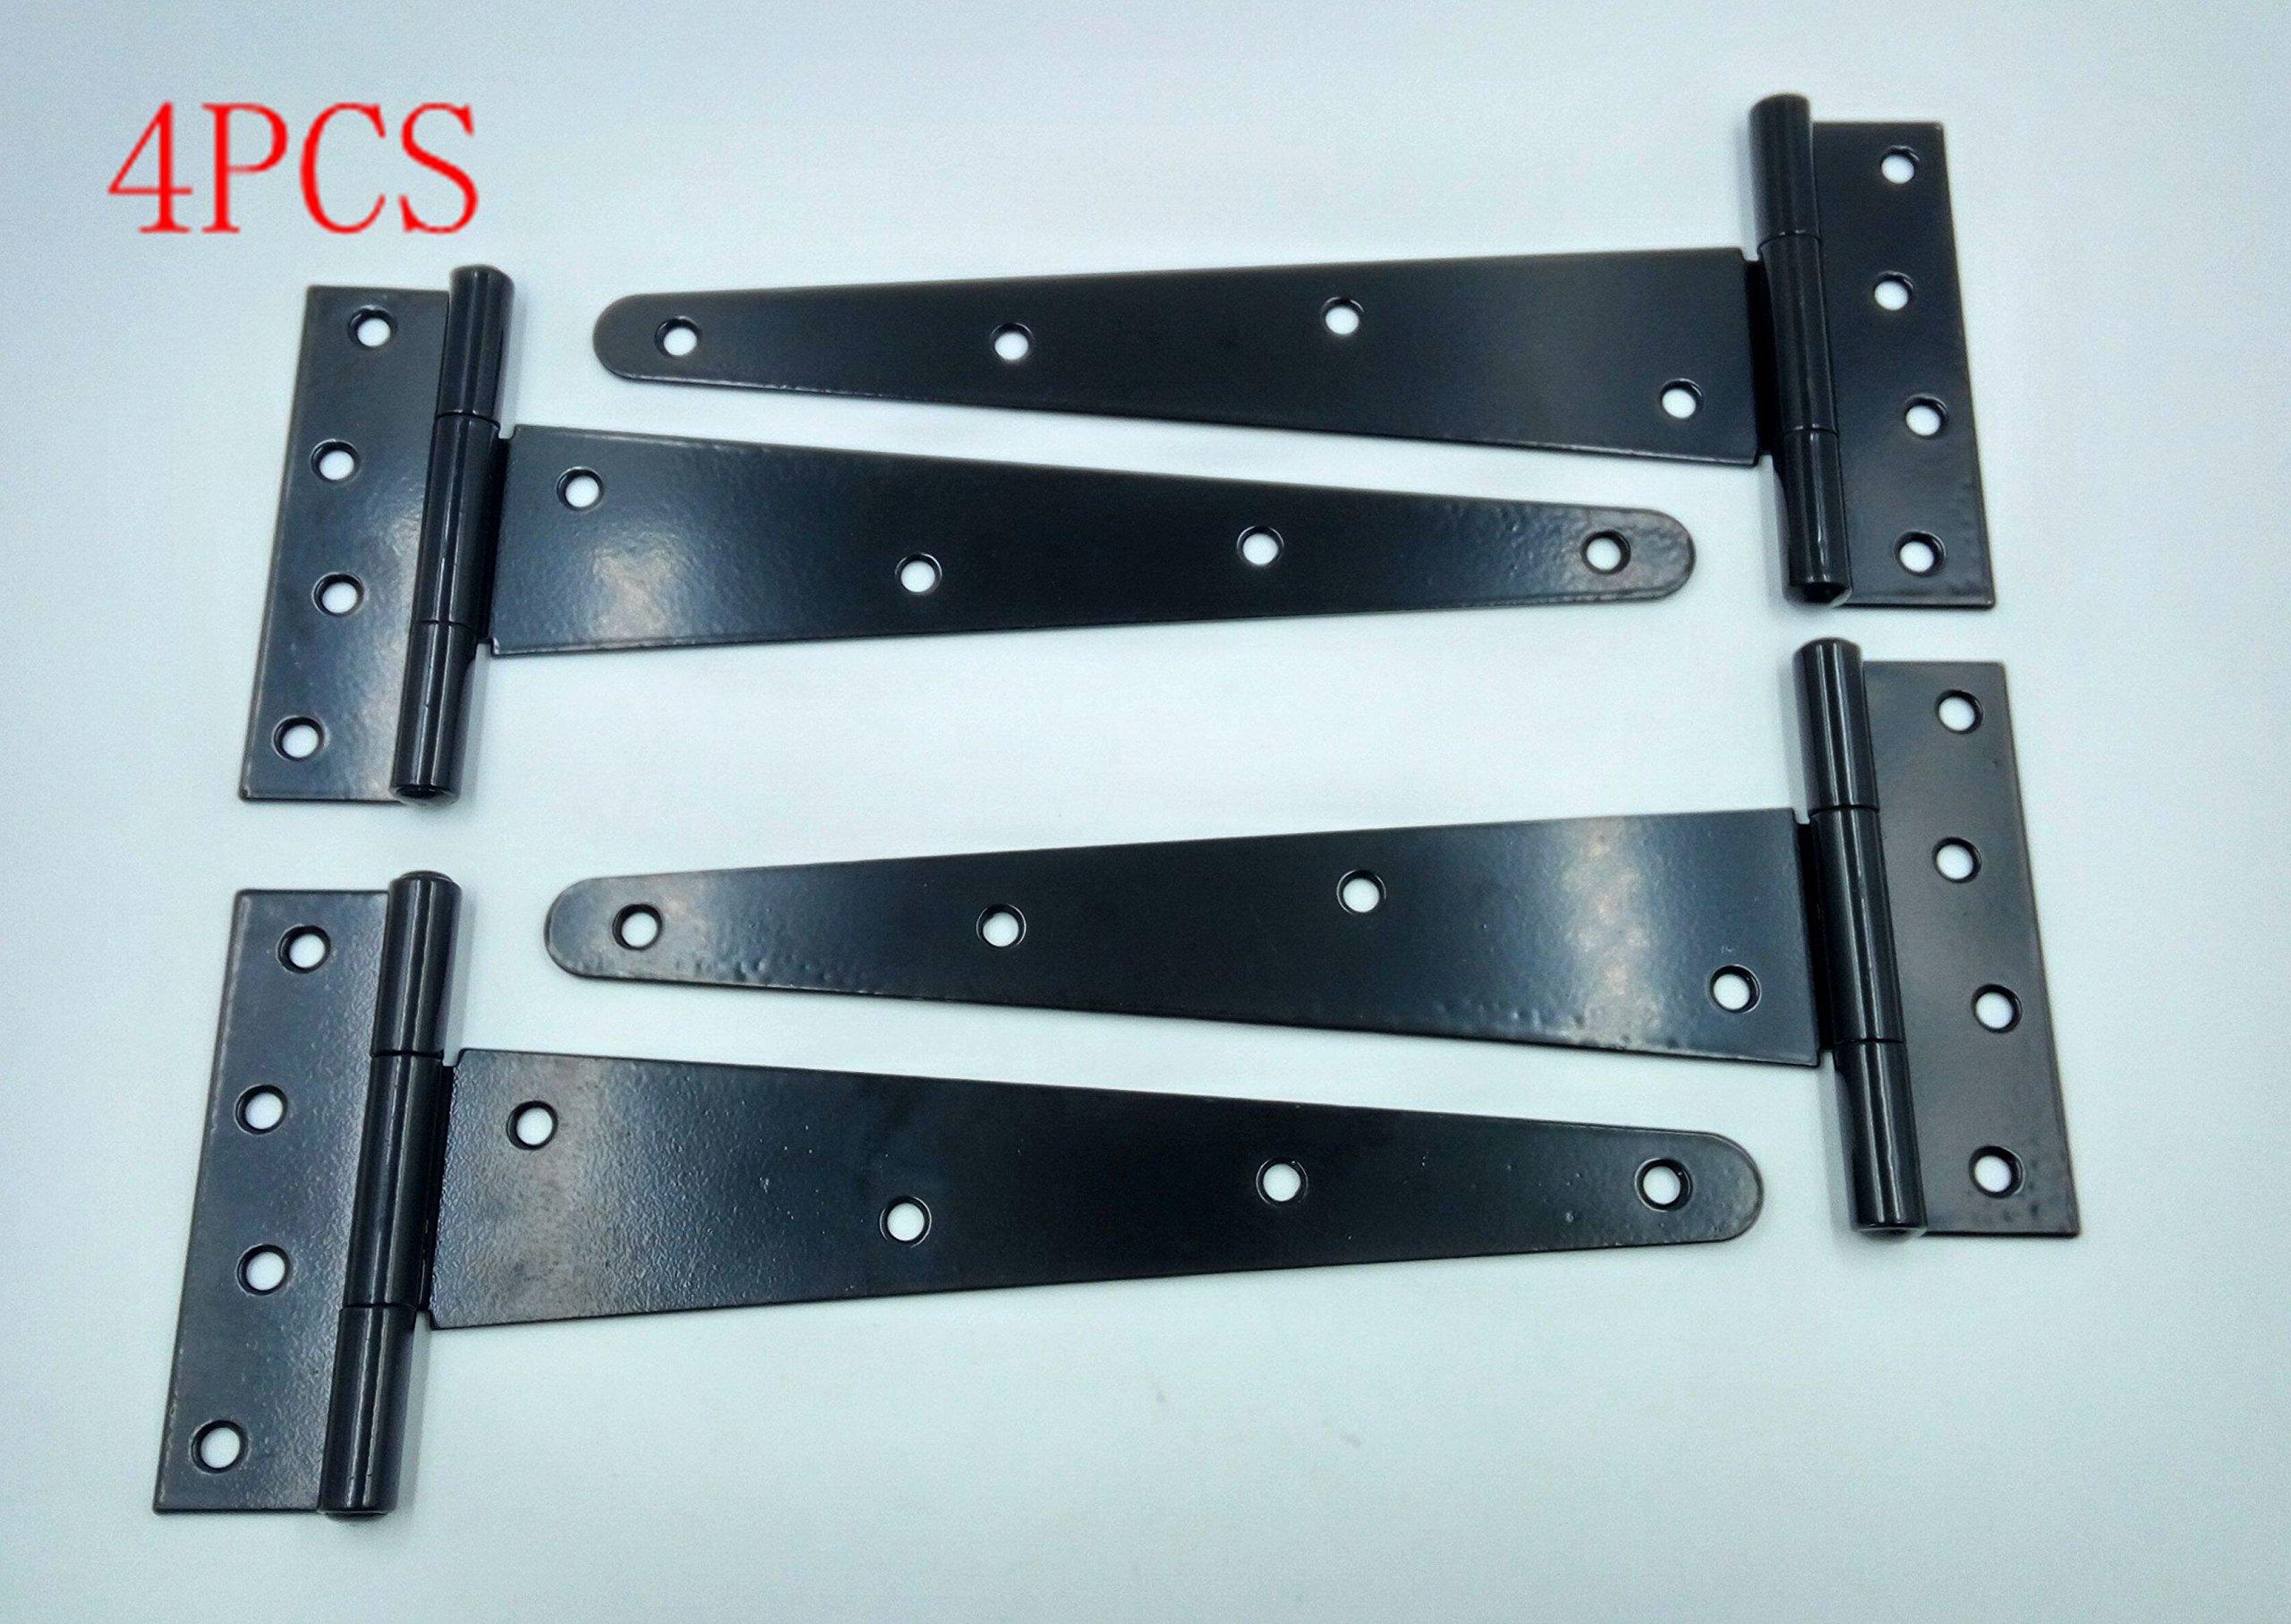 Wang-Data 4PCS T-Strap 11'' Heavy Duty Shed Hinge Gate Decorative Strap Hinge Door Hinges Black Wrought Iron Rustproof